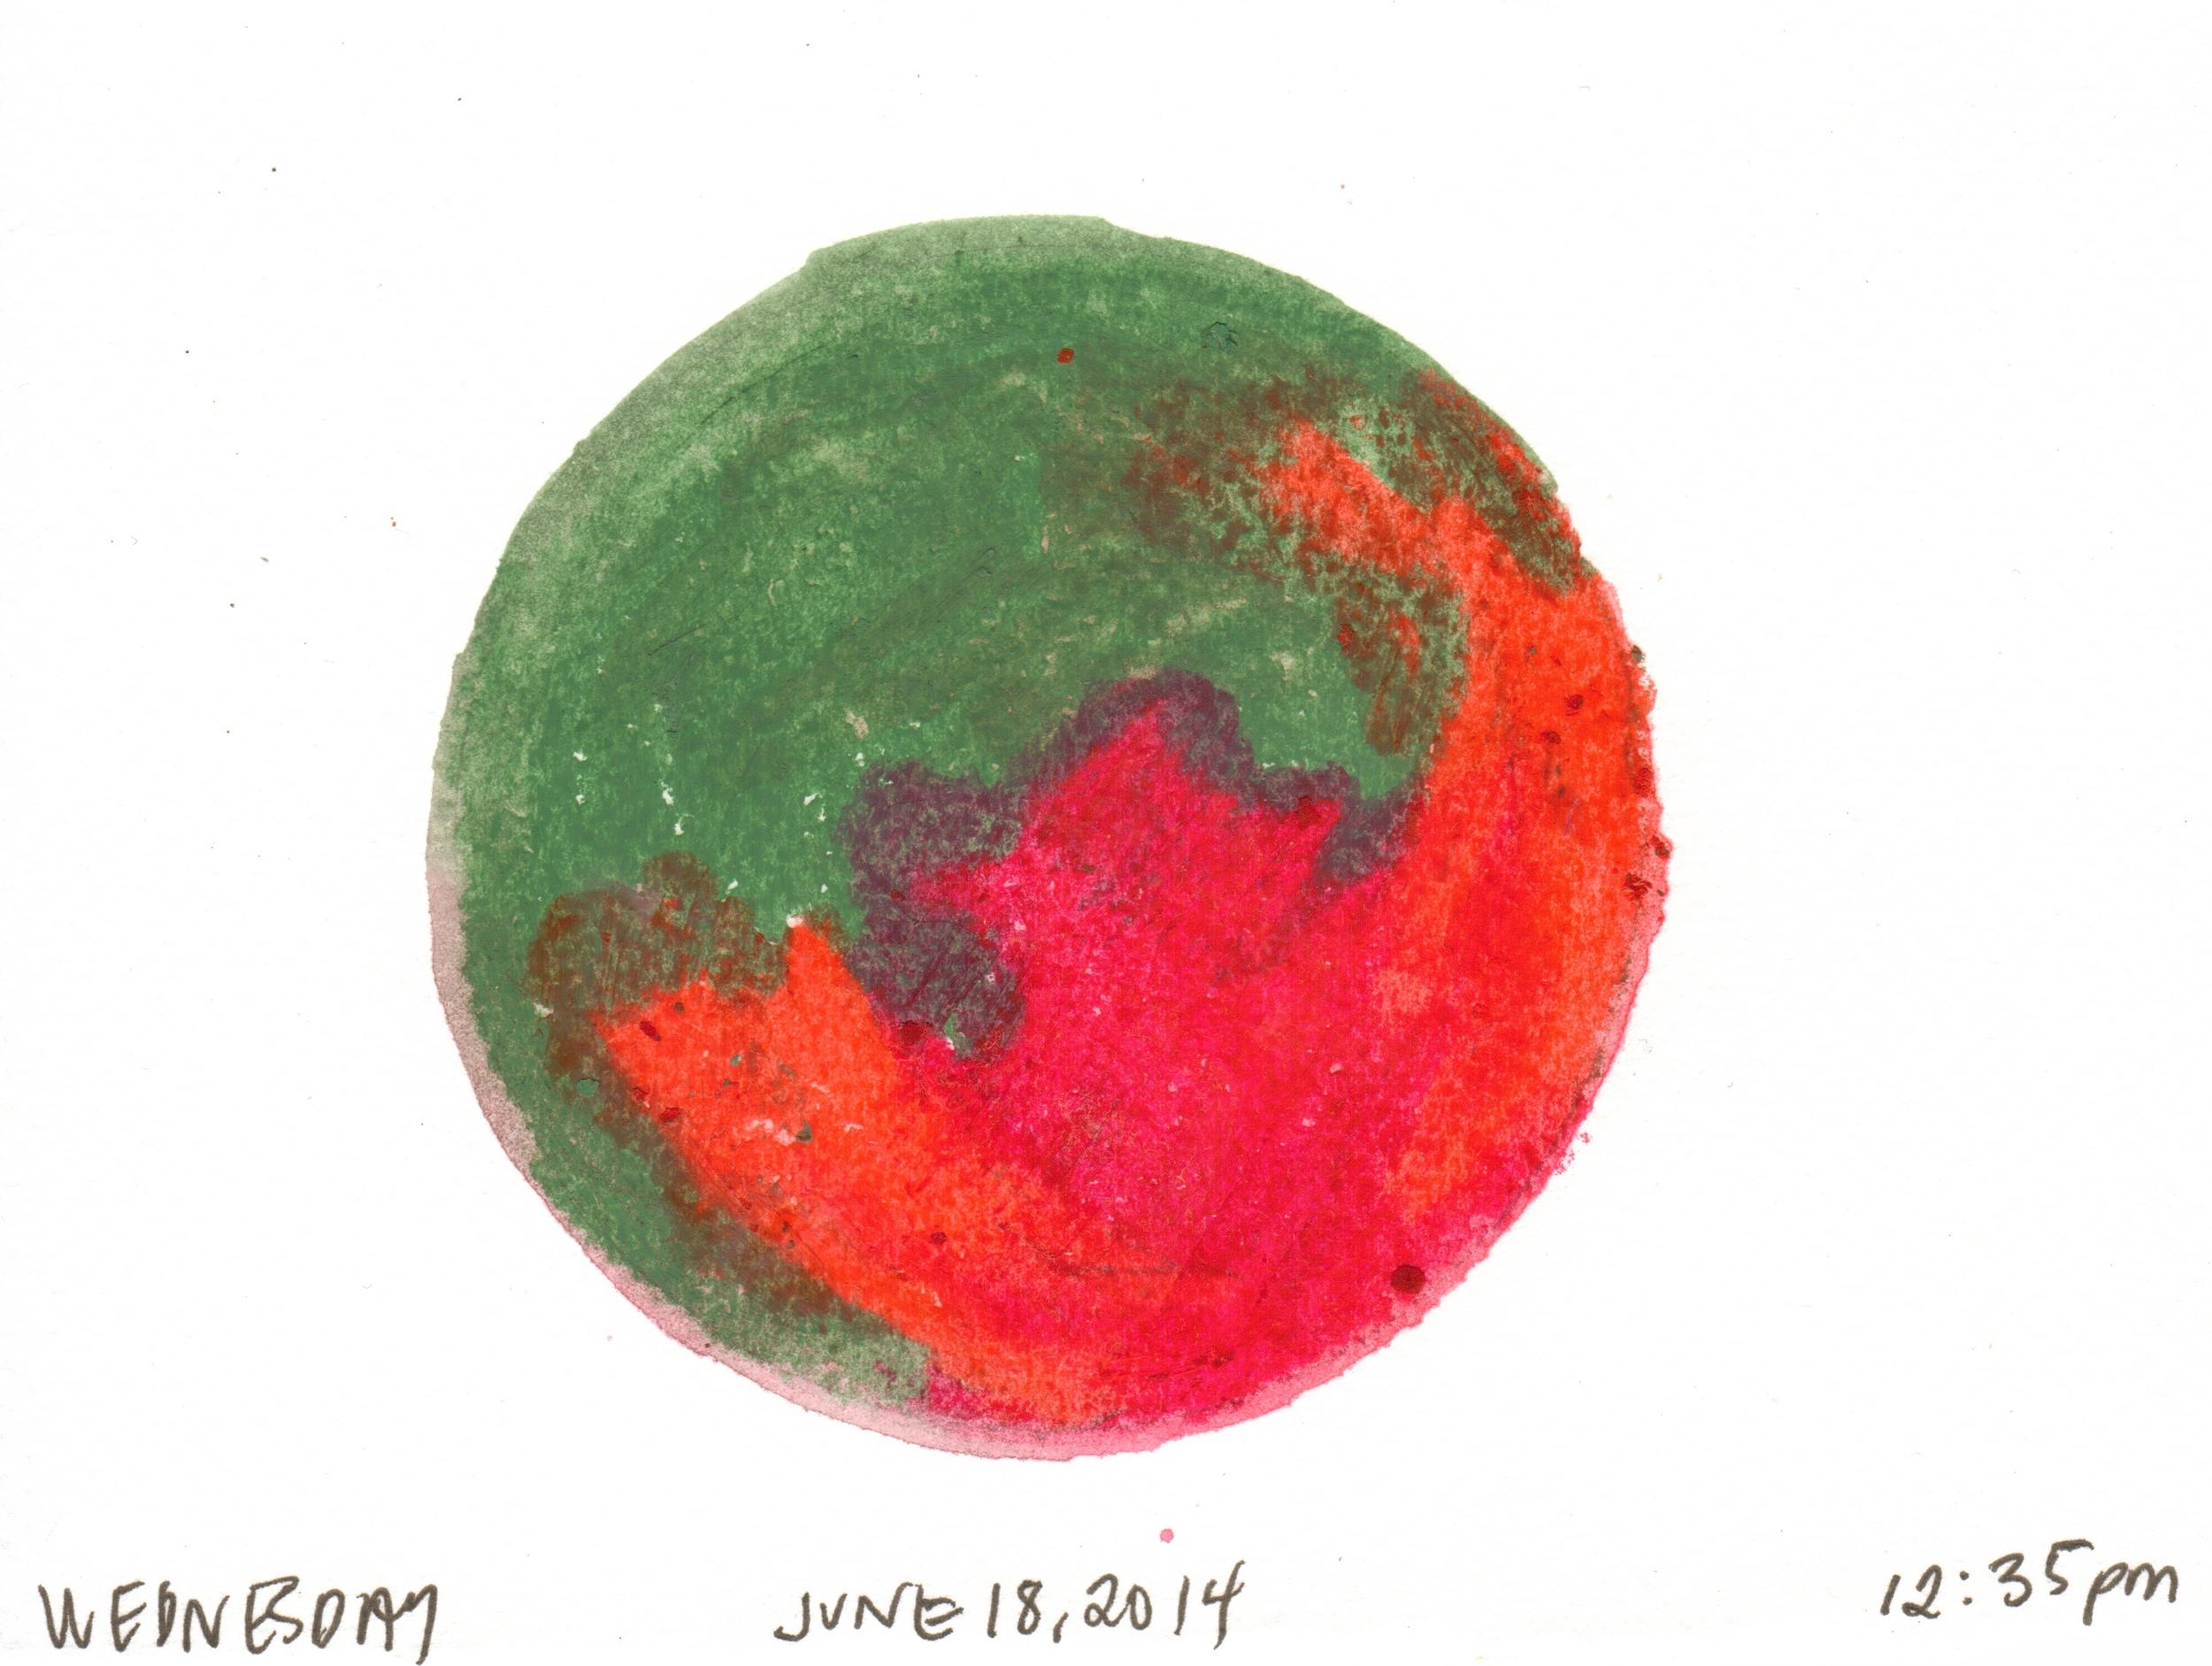 06.18.14